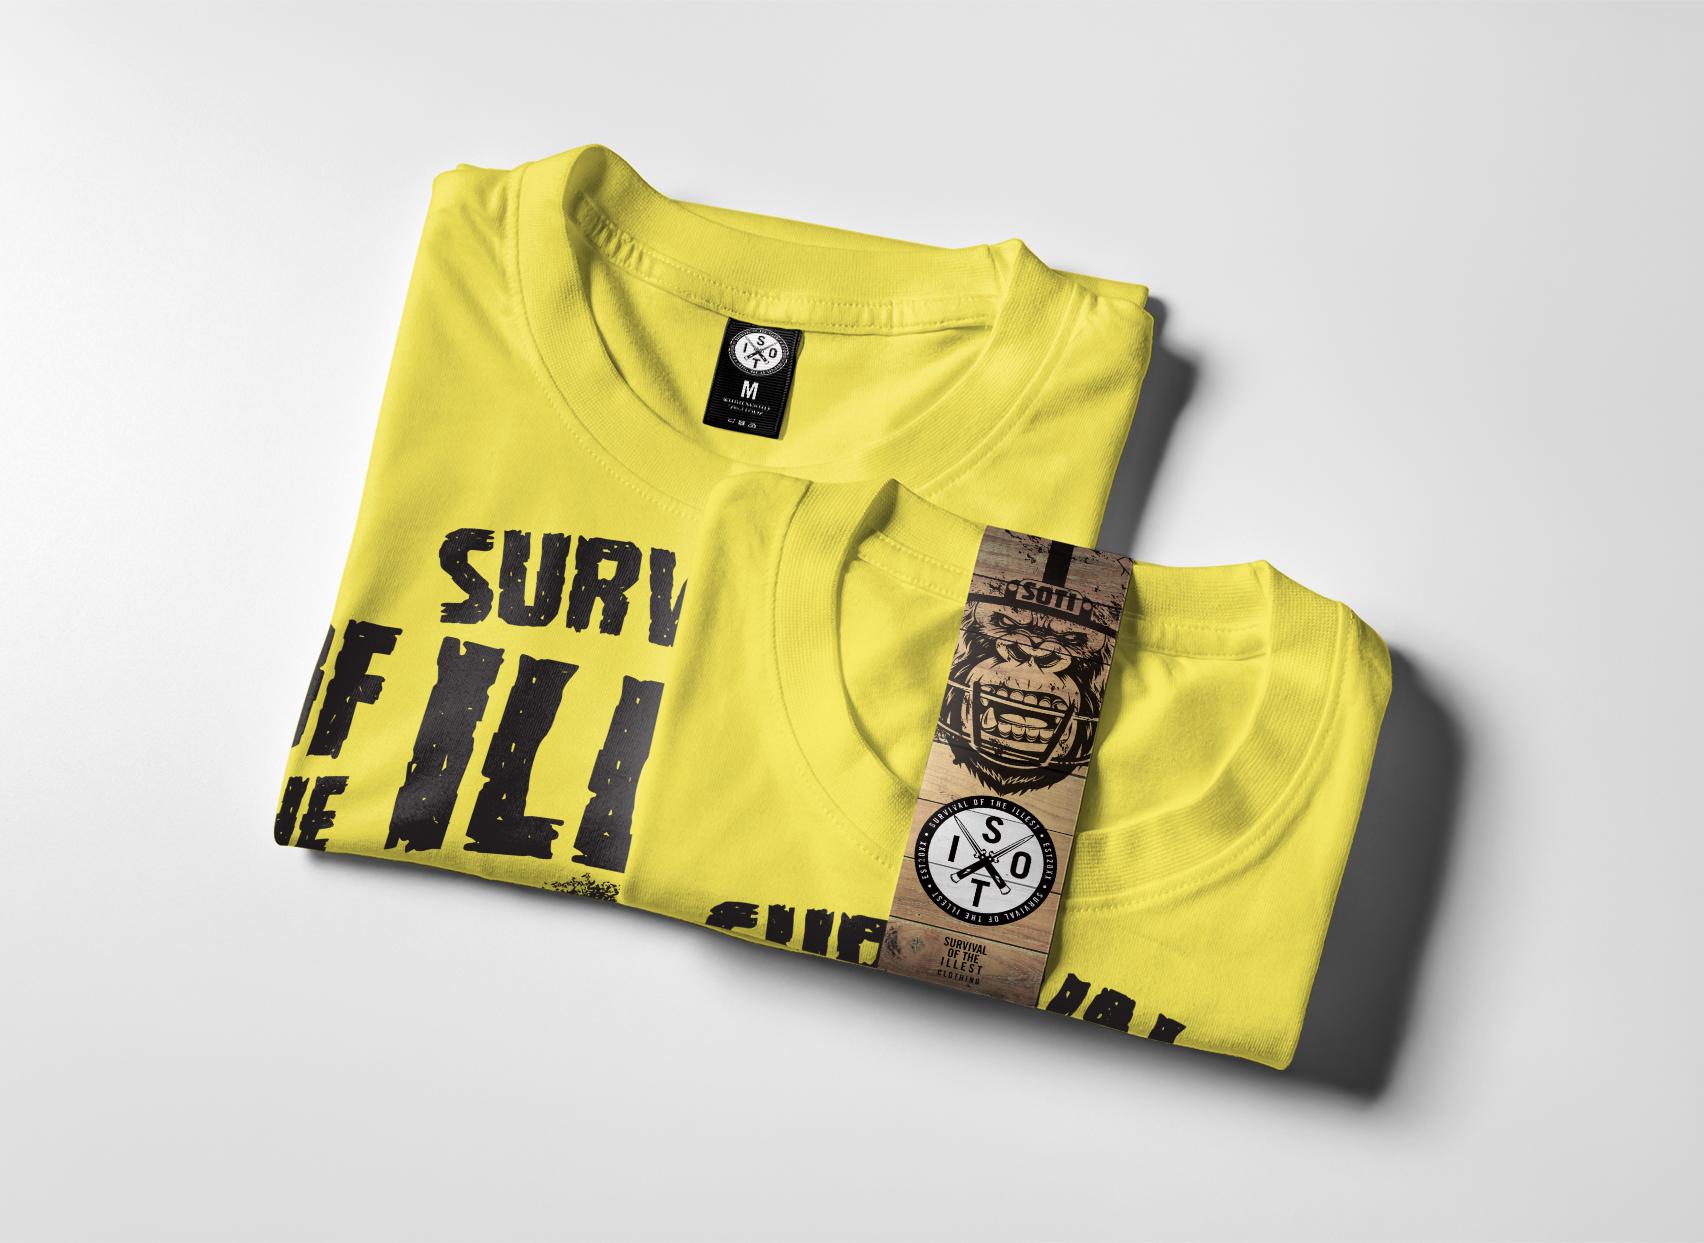 SOTI-shirt-wrapped.jpg